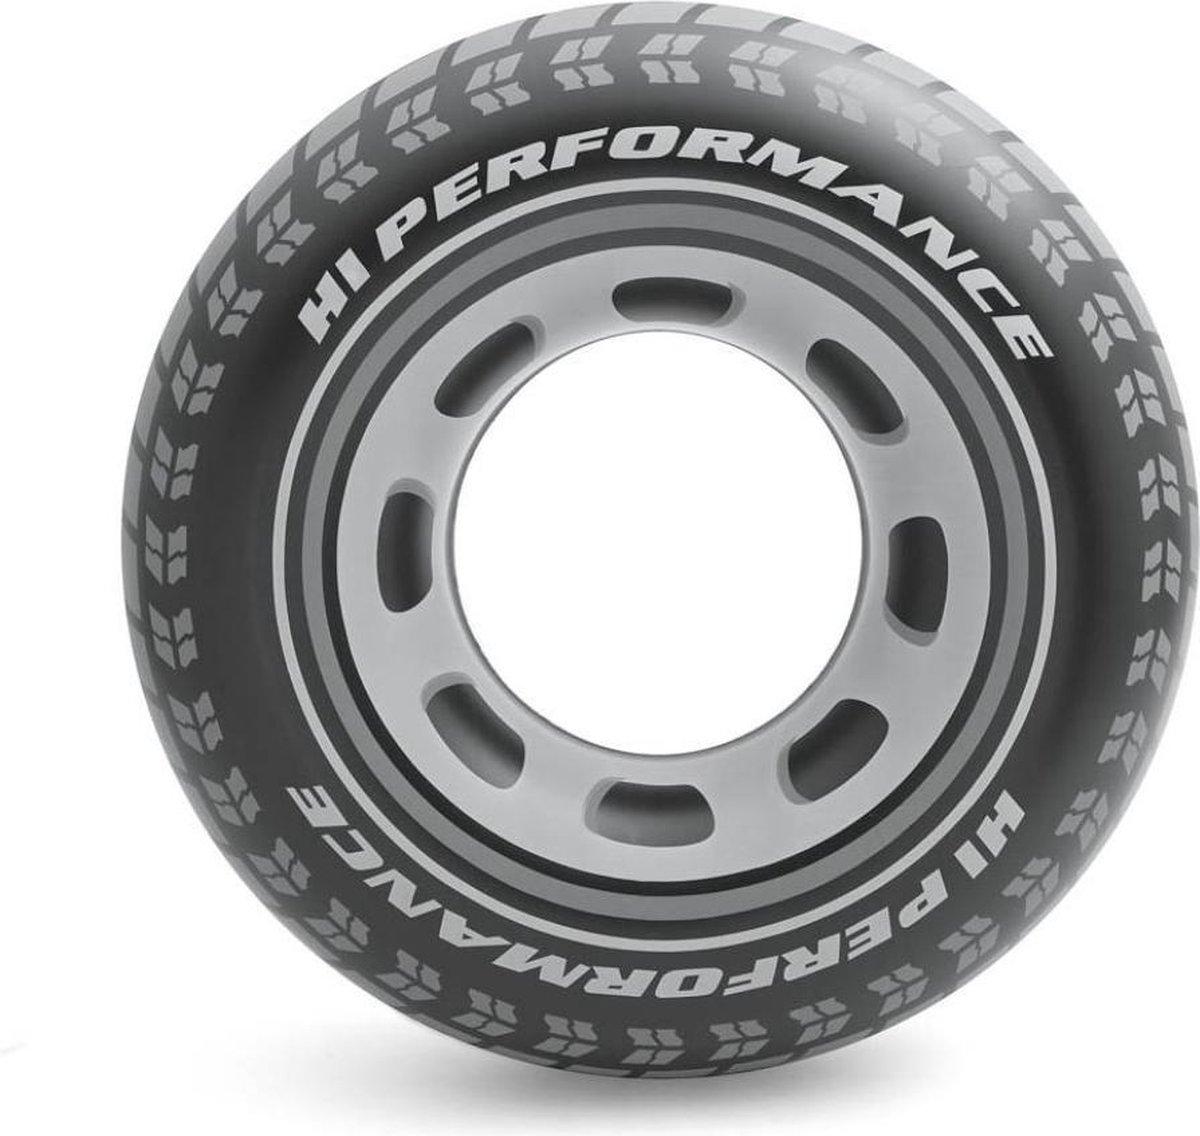 Intex Zwemband Autoband - 91cm - Opblaasbaar - Met Veiligheidsventiel